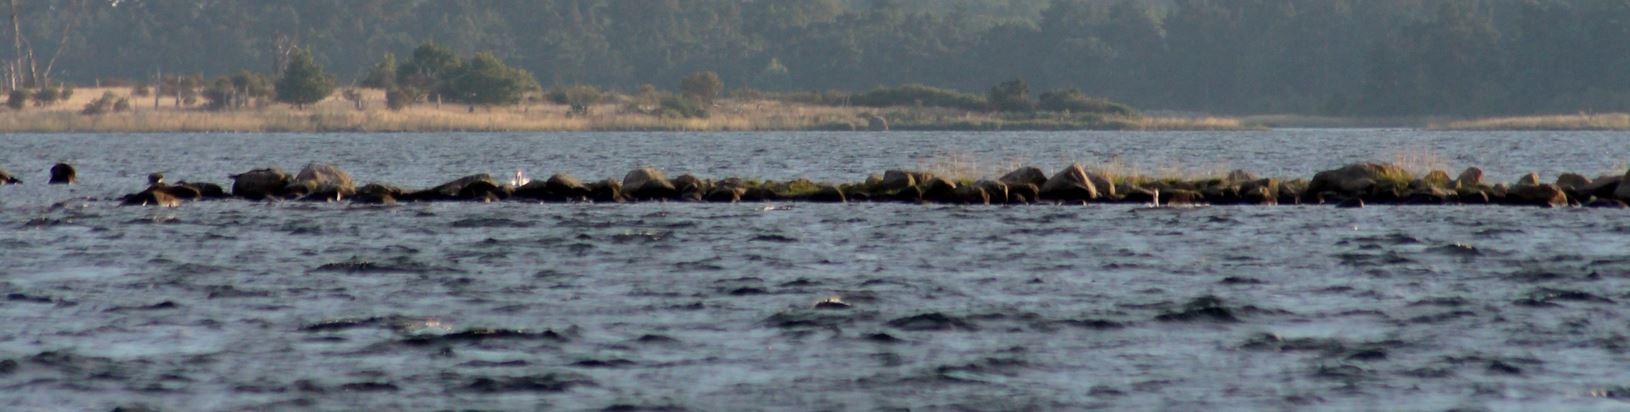 Ann-Sofie Gränefält, Seal safari from Bergkvara